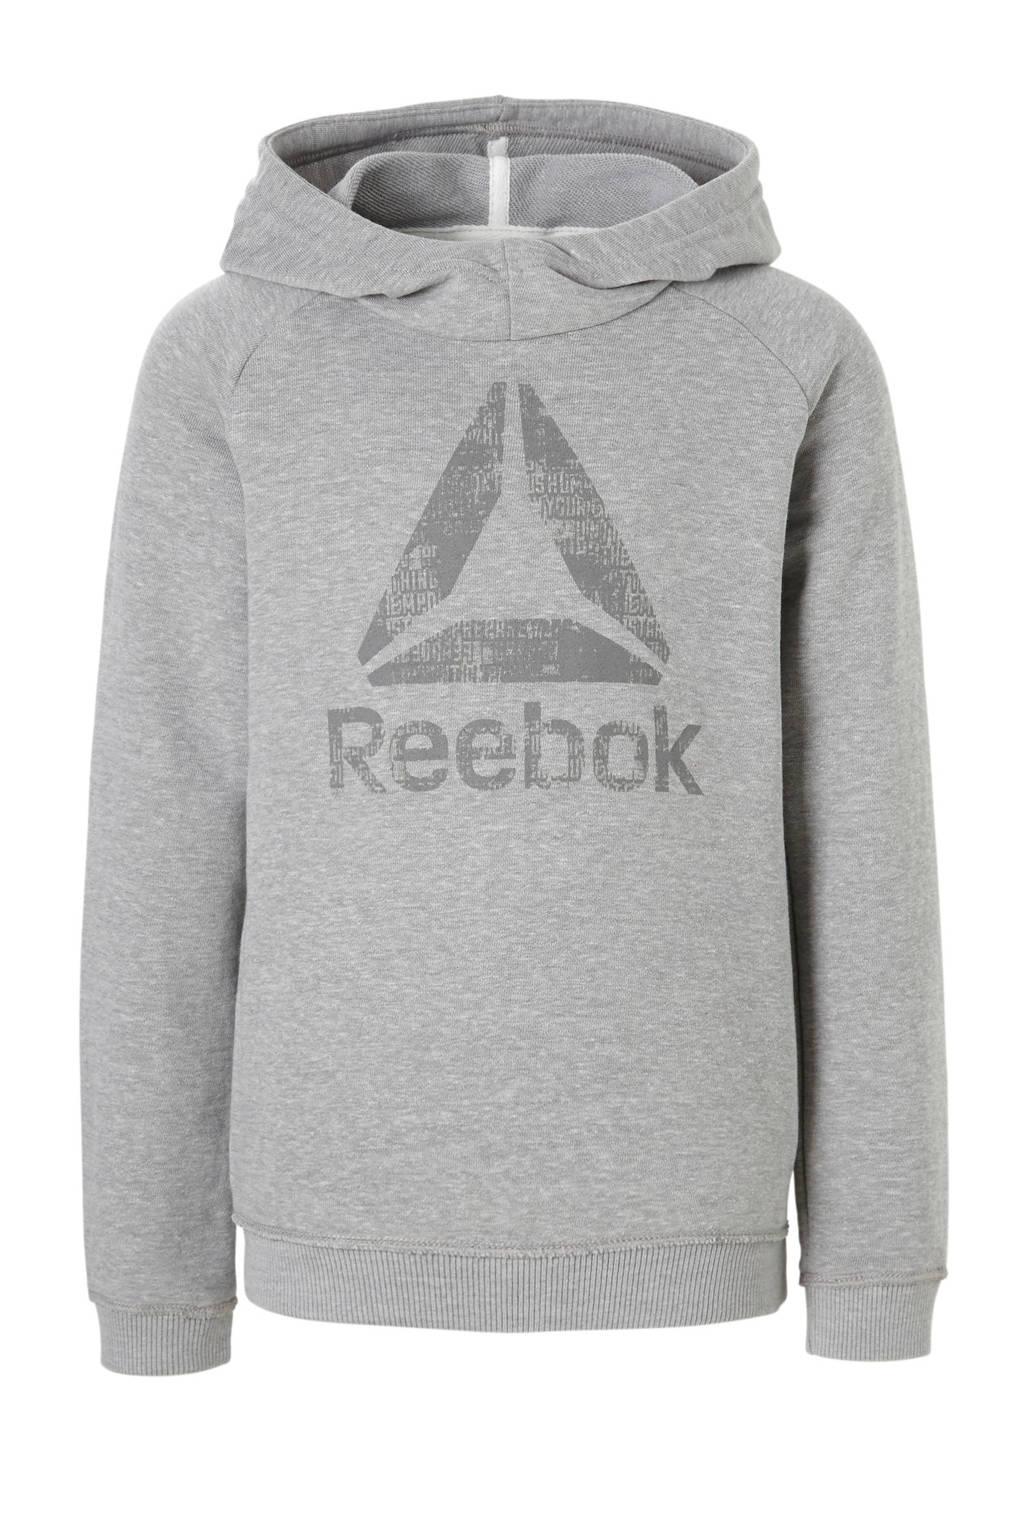 Reebok Fitness   sportsweater lichtgrijs, Lichtgrijs